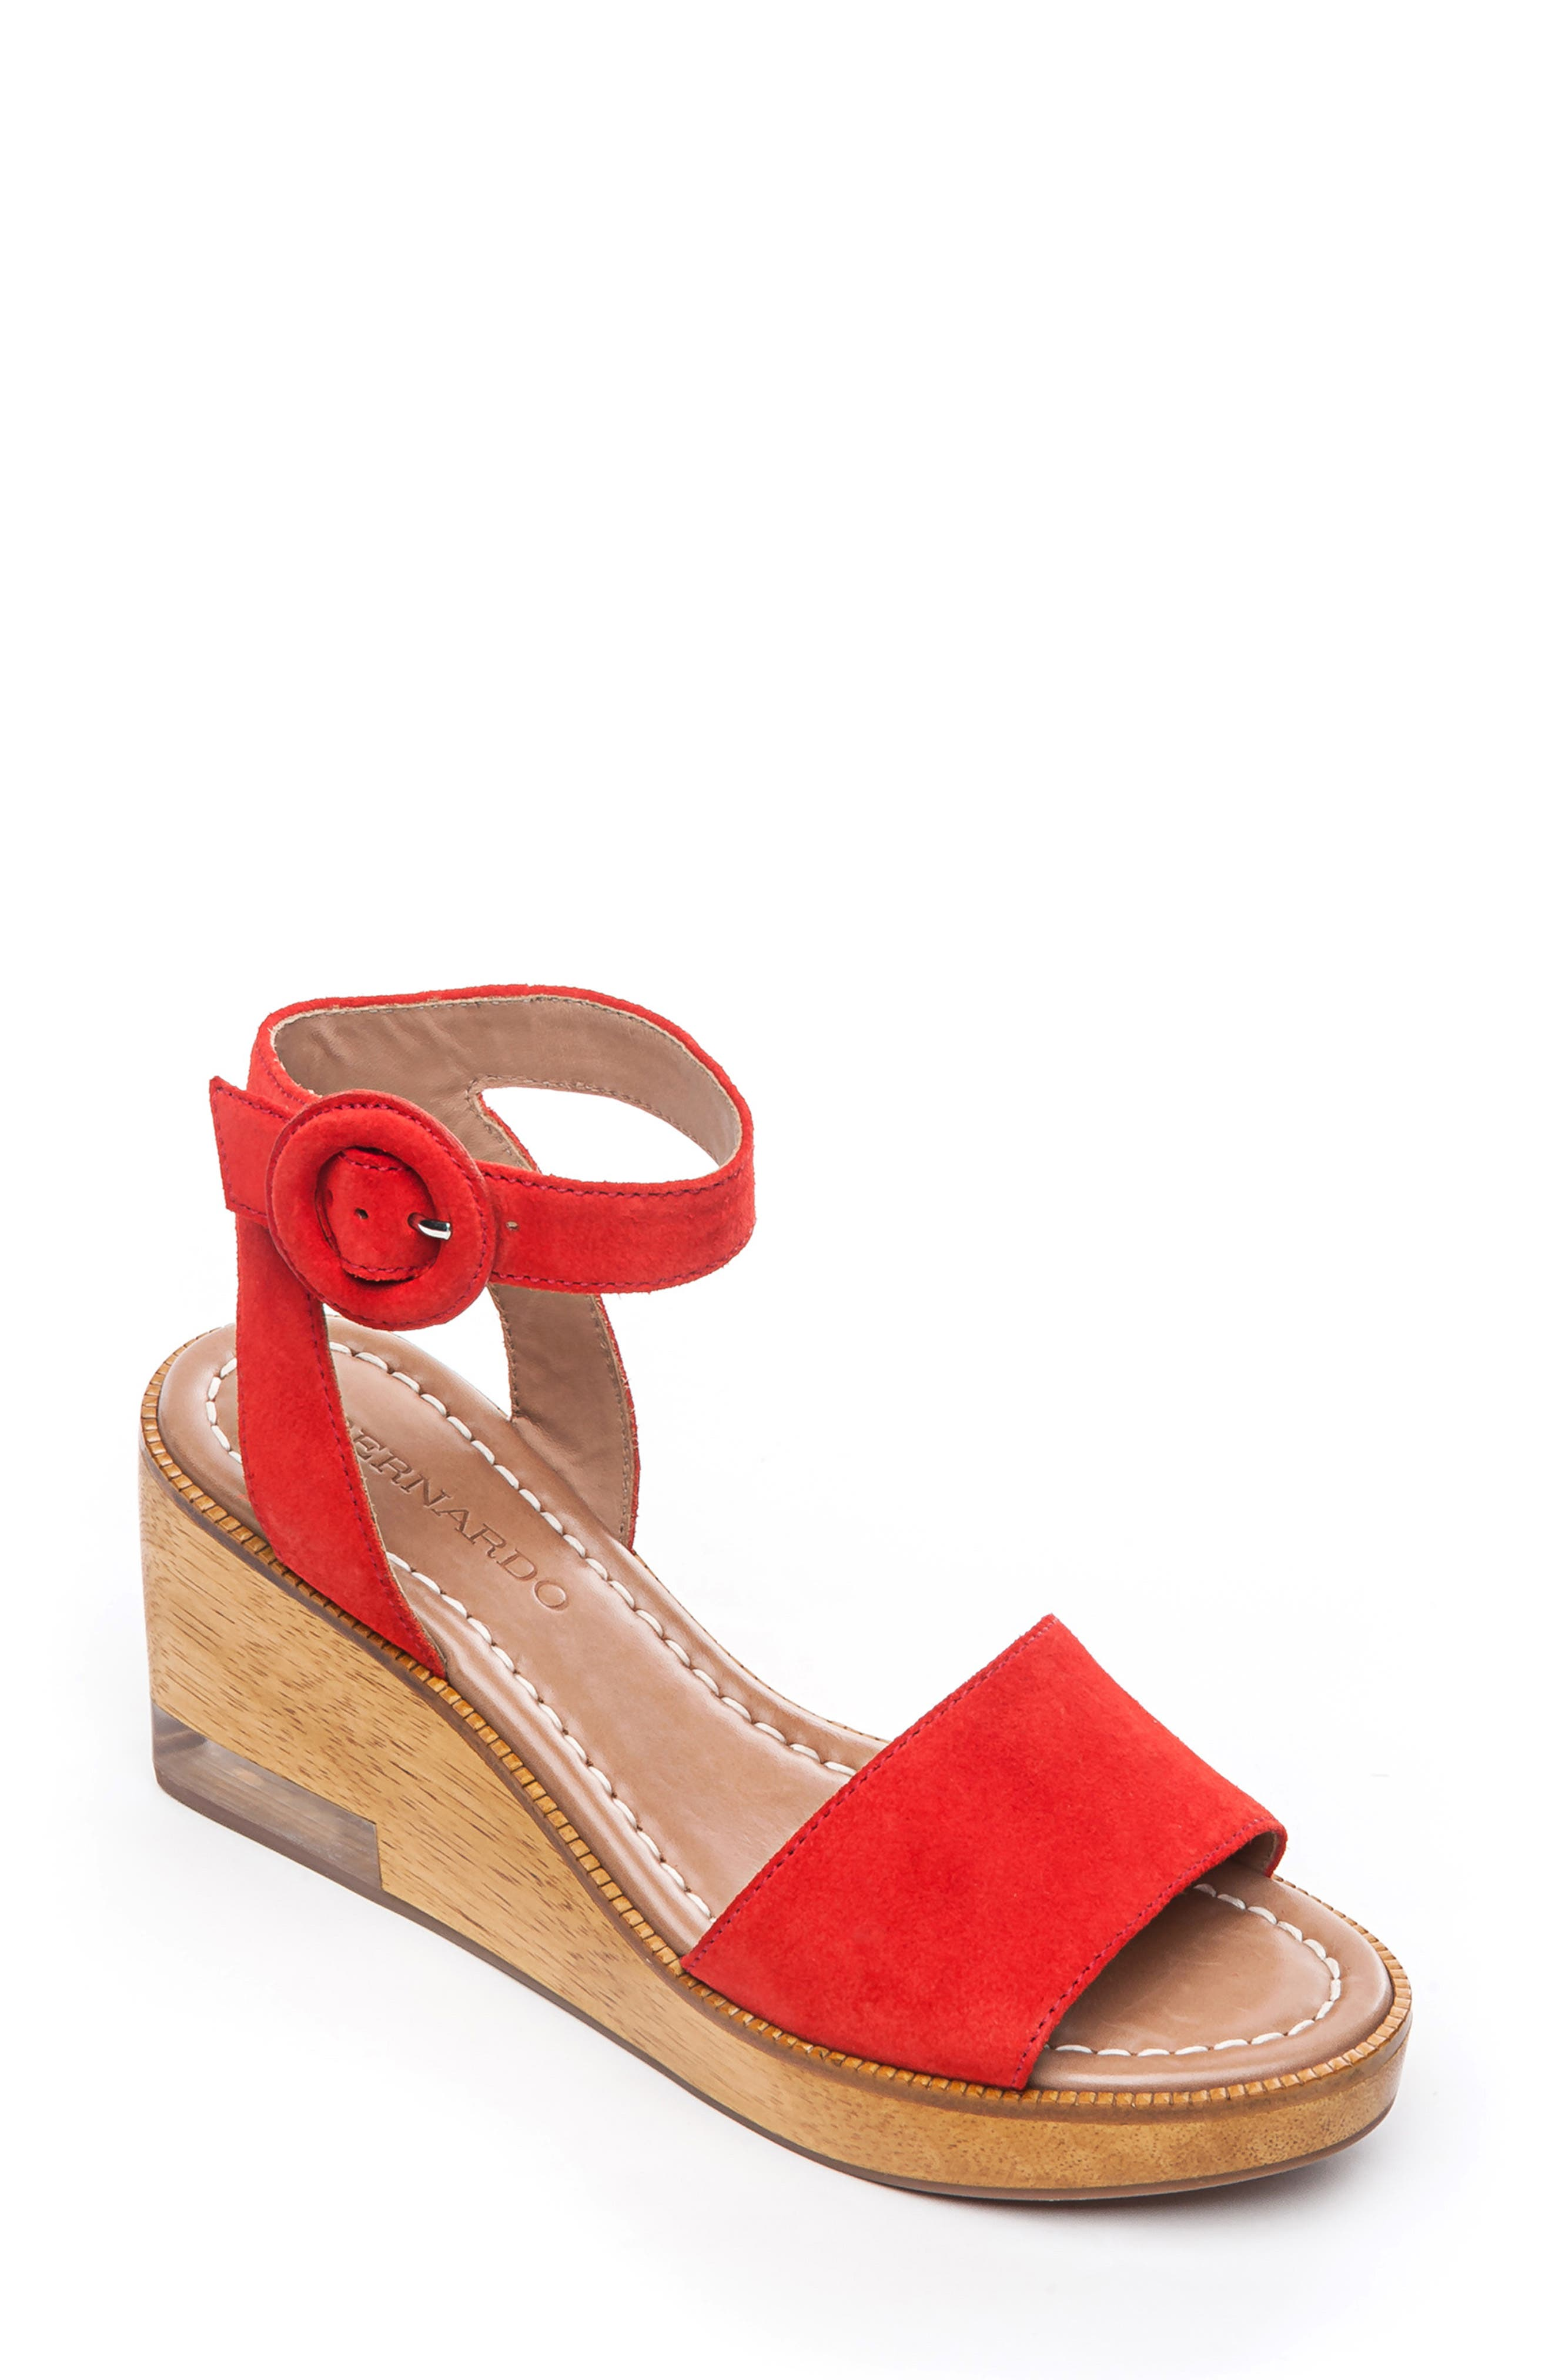 Bernardo Kate Platform Wedge Sandal- Red